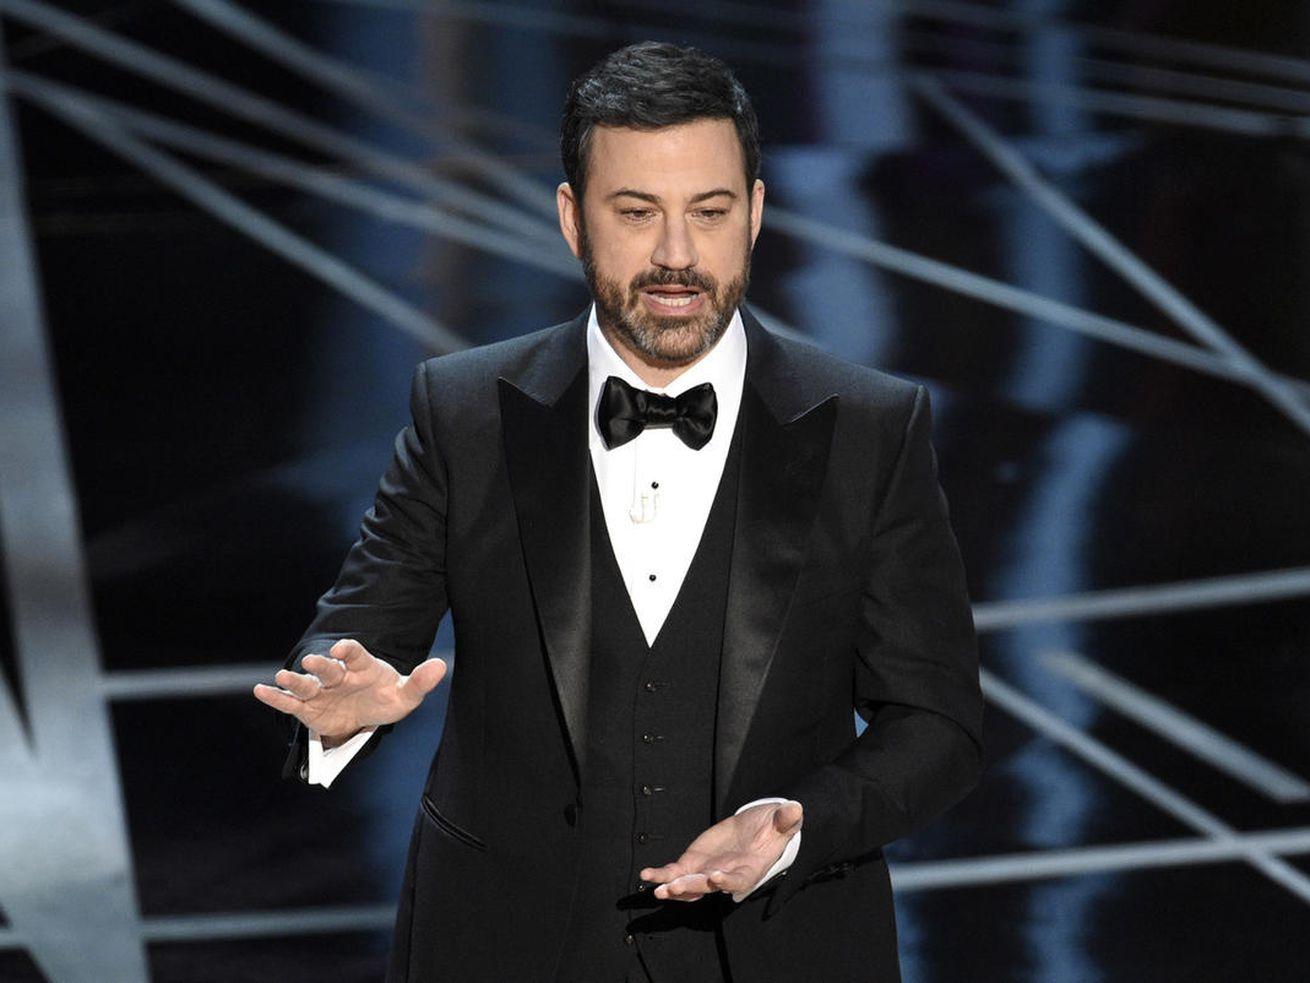 Host Jimmy Kimmel speaks at the Oscars on Sunday, Feb. 26.